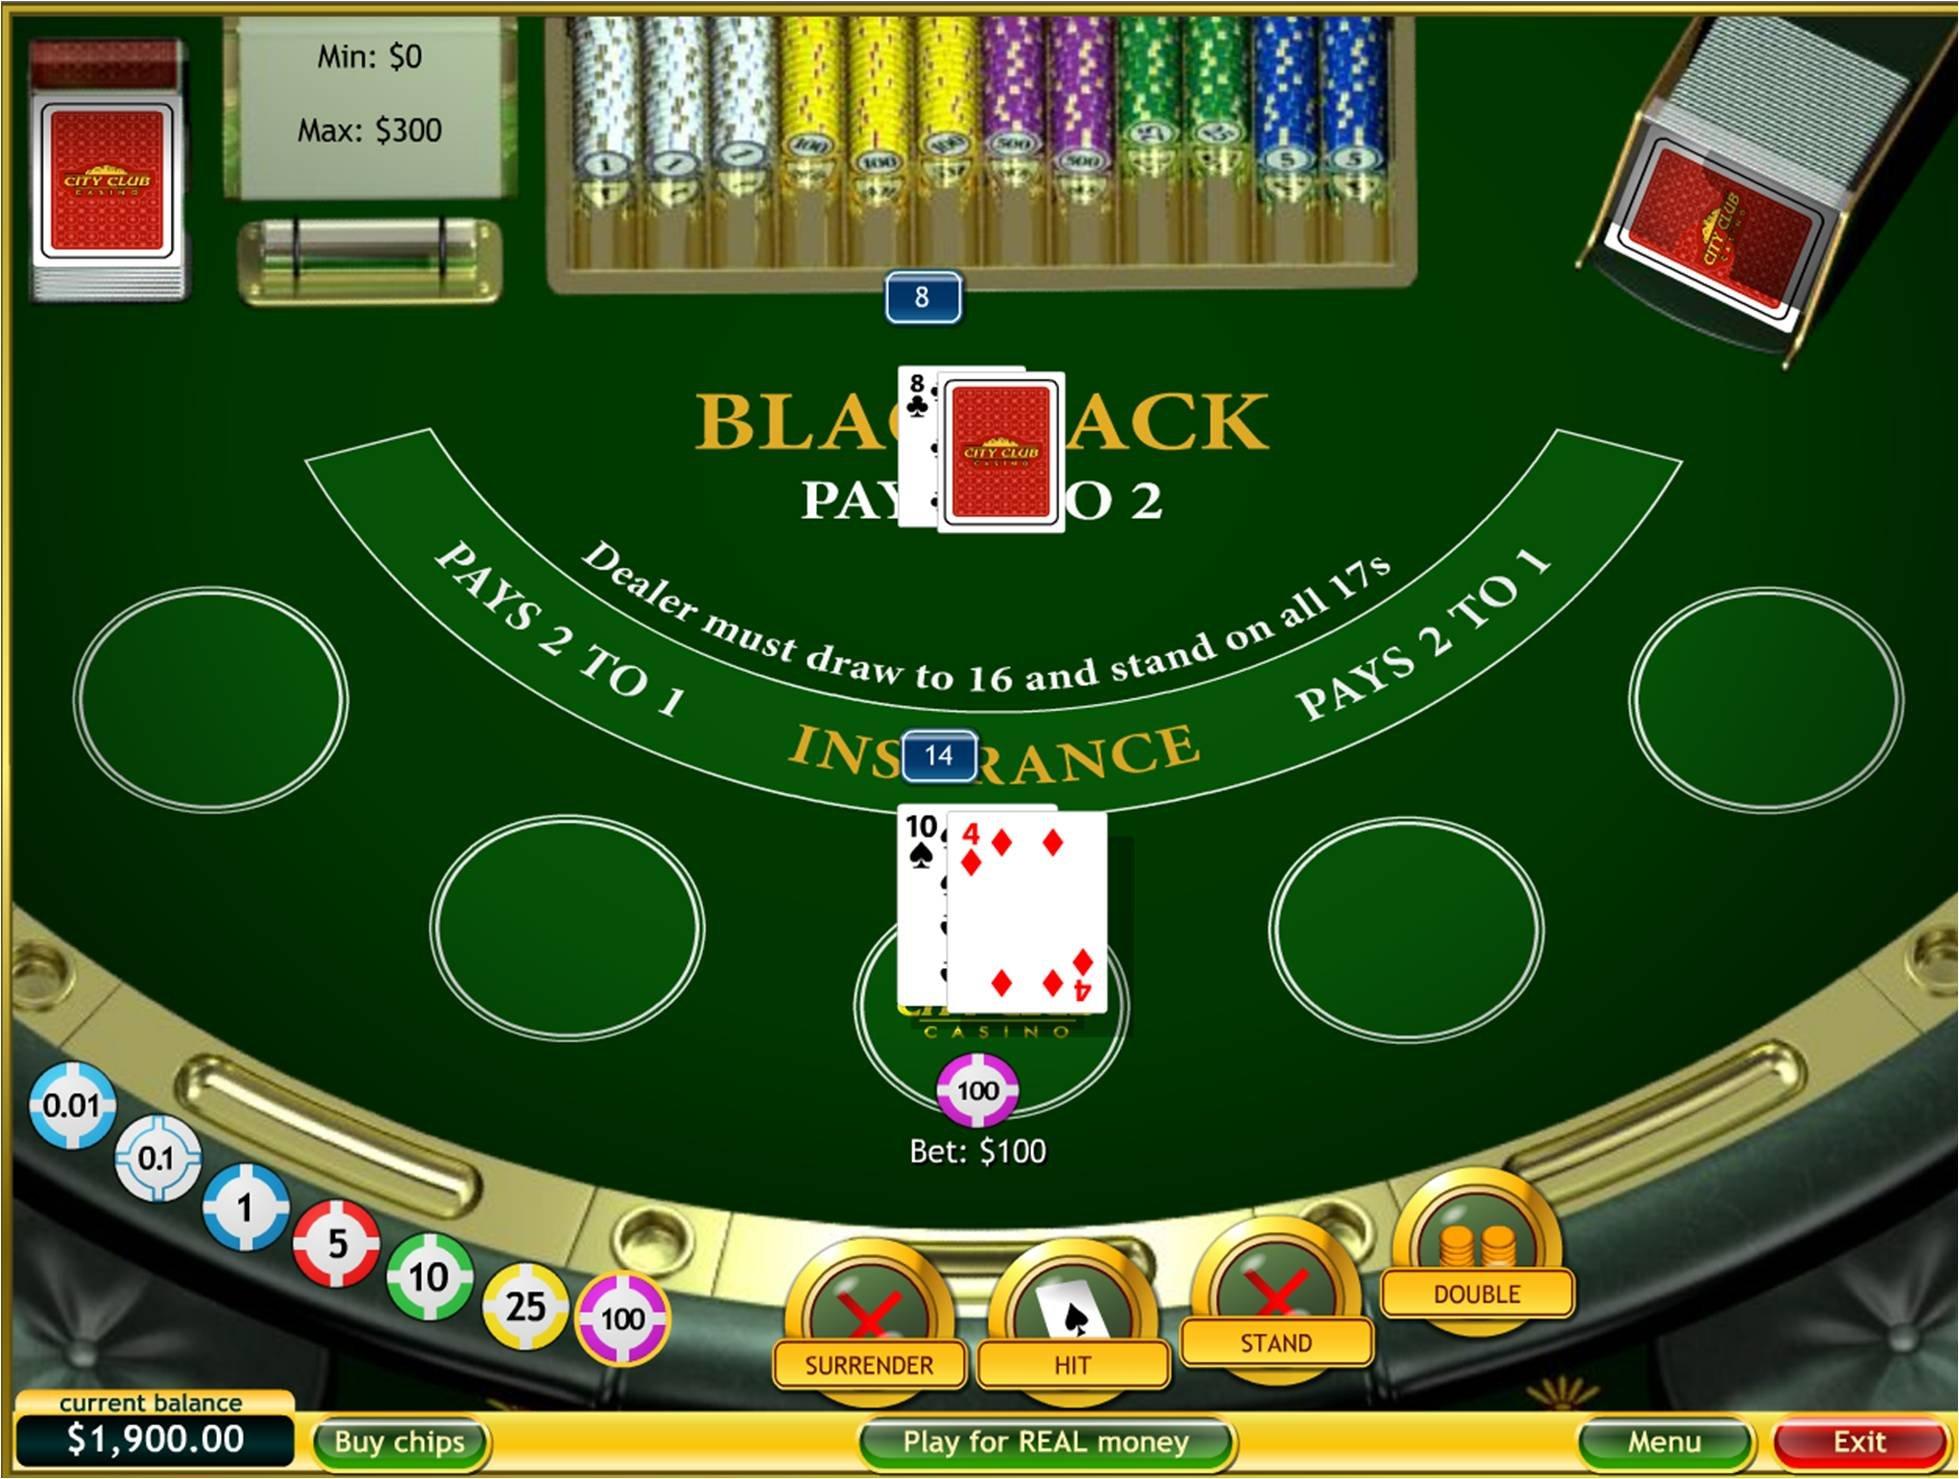 Blackjack table wallpaper - Blackjack Table Wallpaper 30